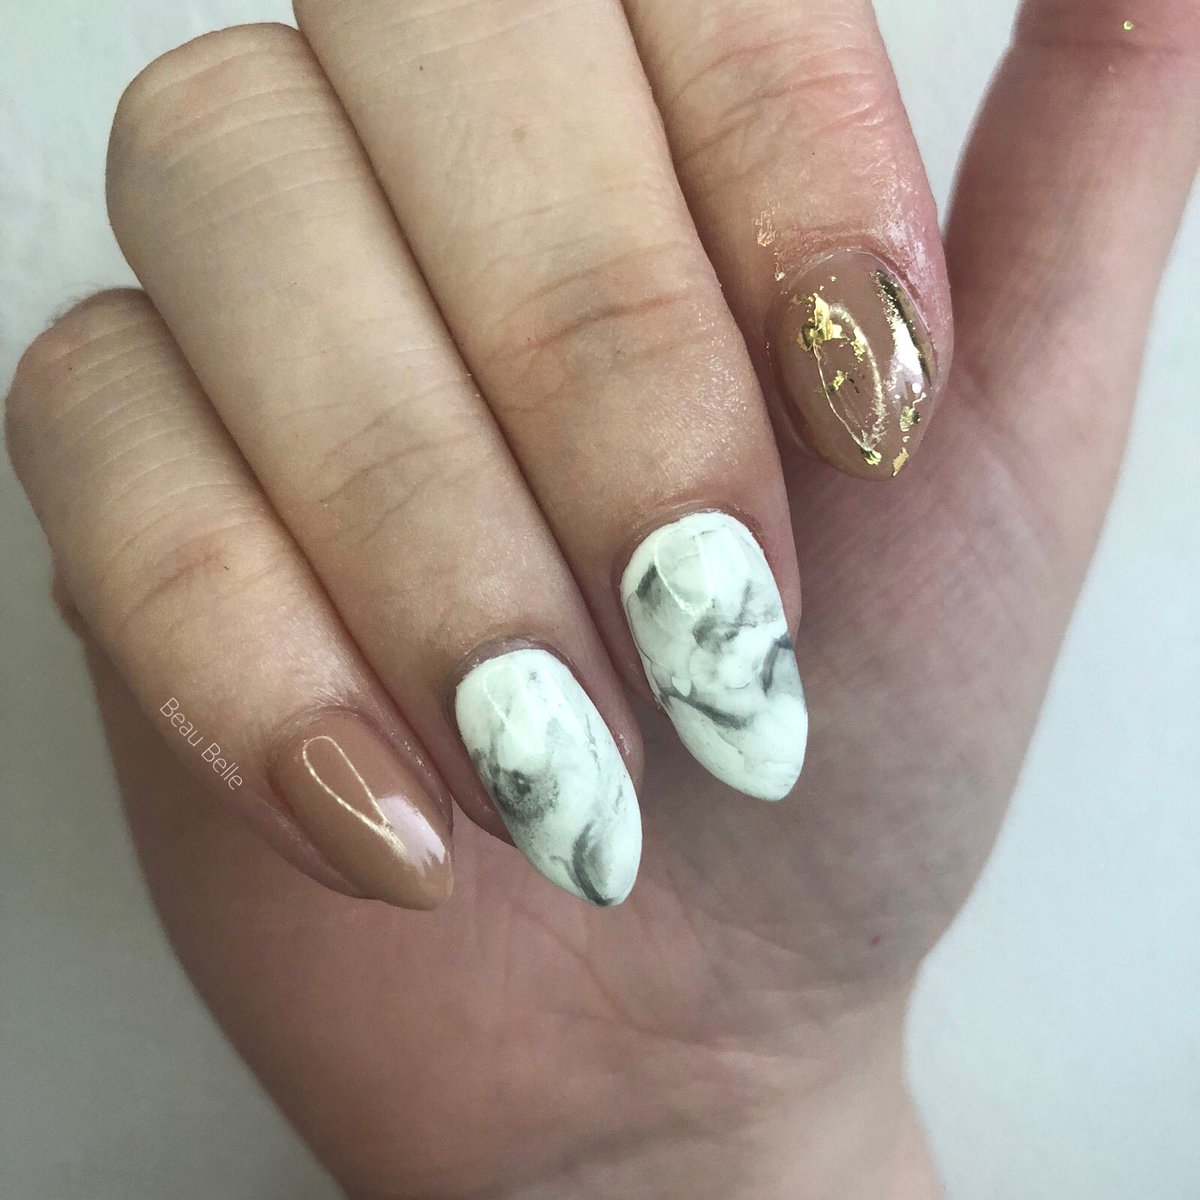 marblenails hashtag on Twitter